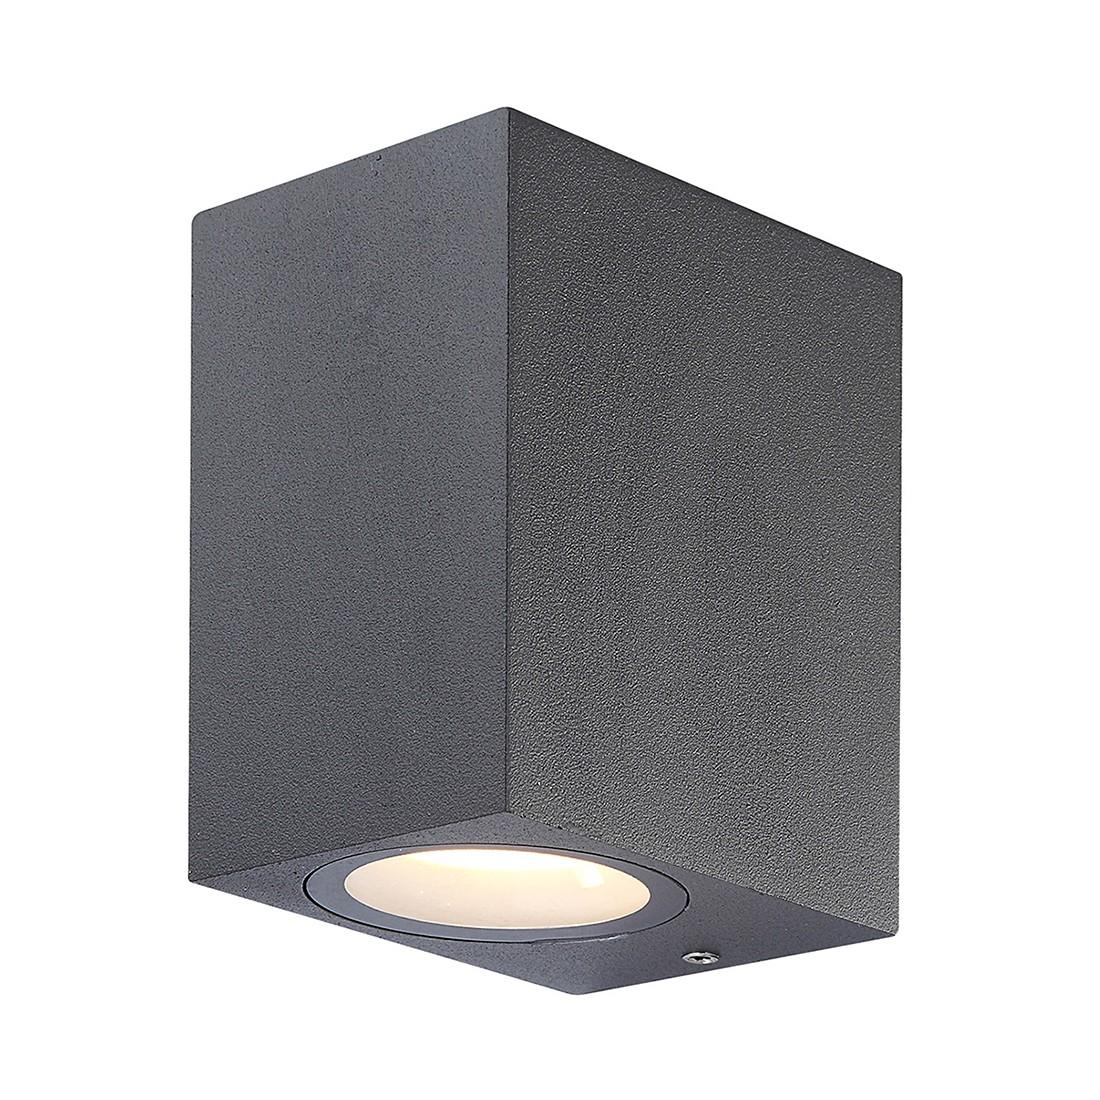 EEK A+, LED-Außenleuchte Skathi by Globo - Aluminium/Glas - Grau, Globo Lighting